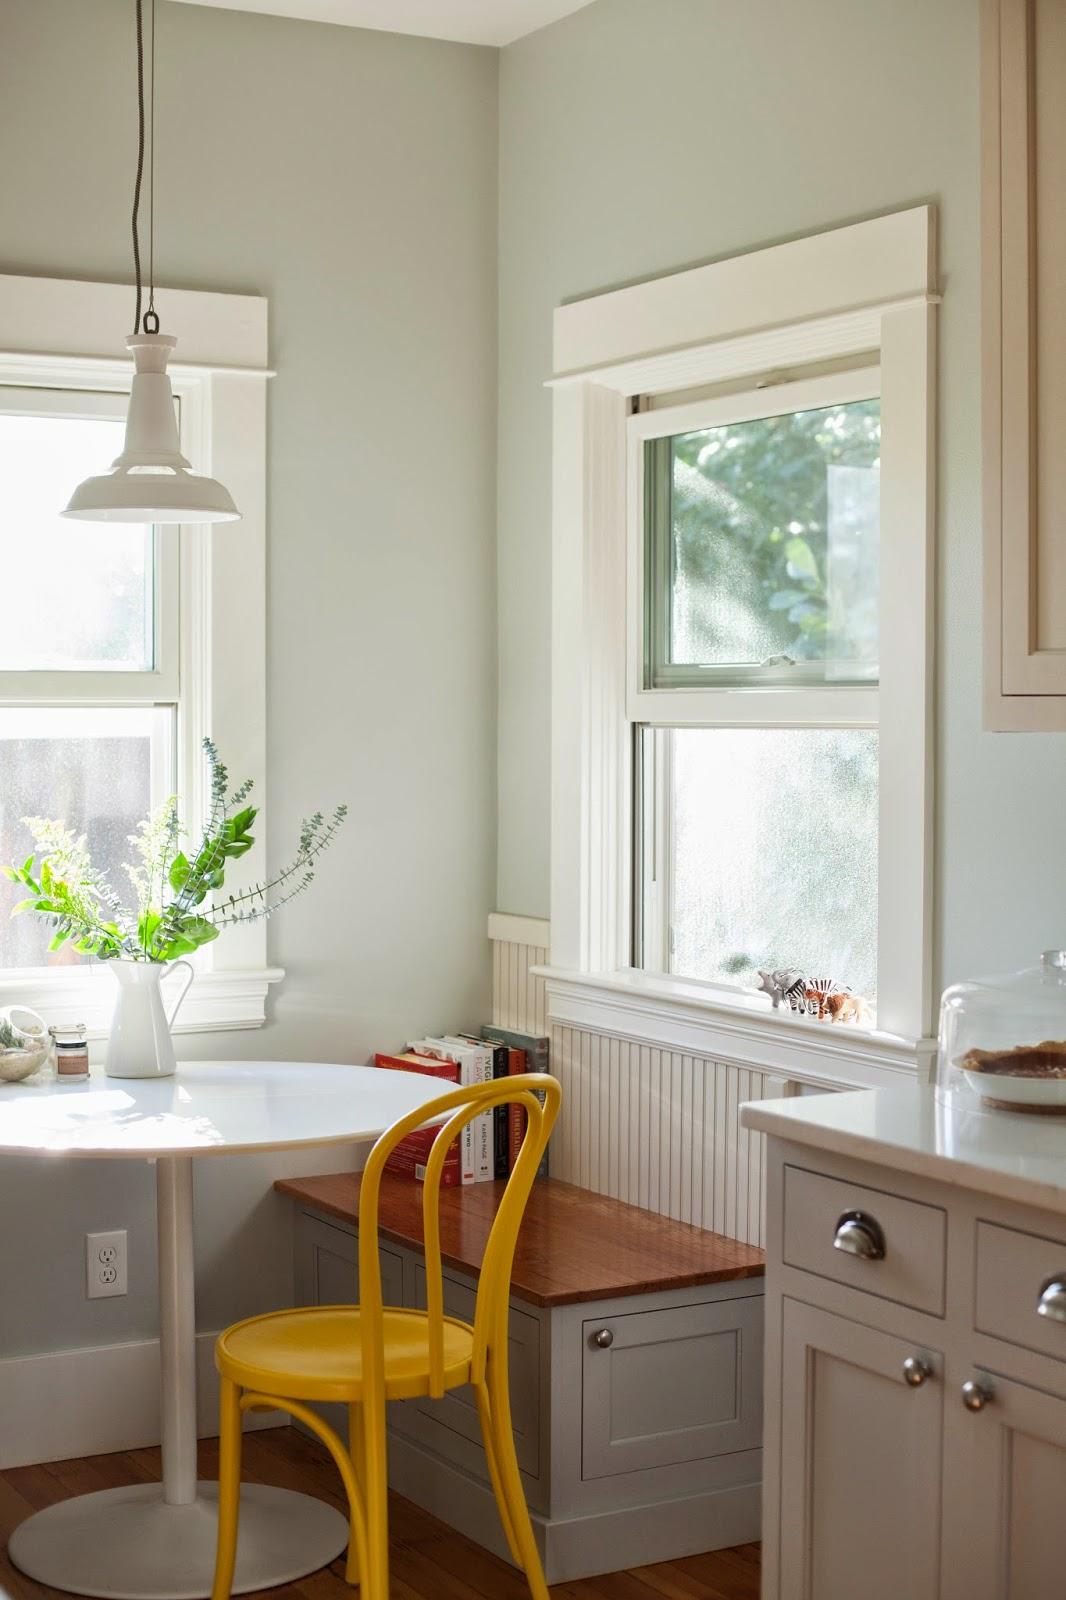 Hummingbird High\'s Kitchen Remodel, Pt. III: After | hummingbird ...